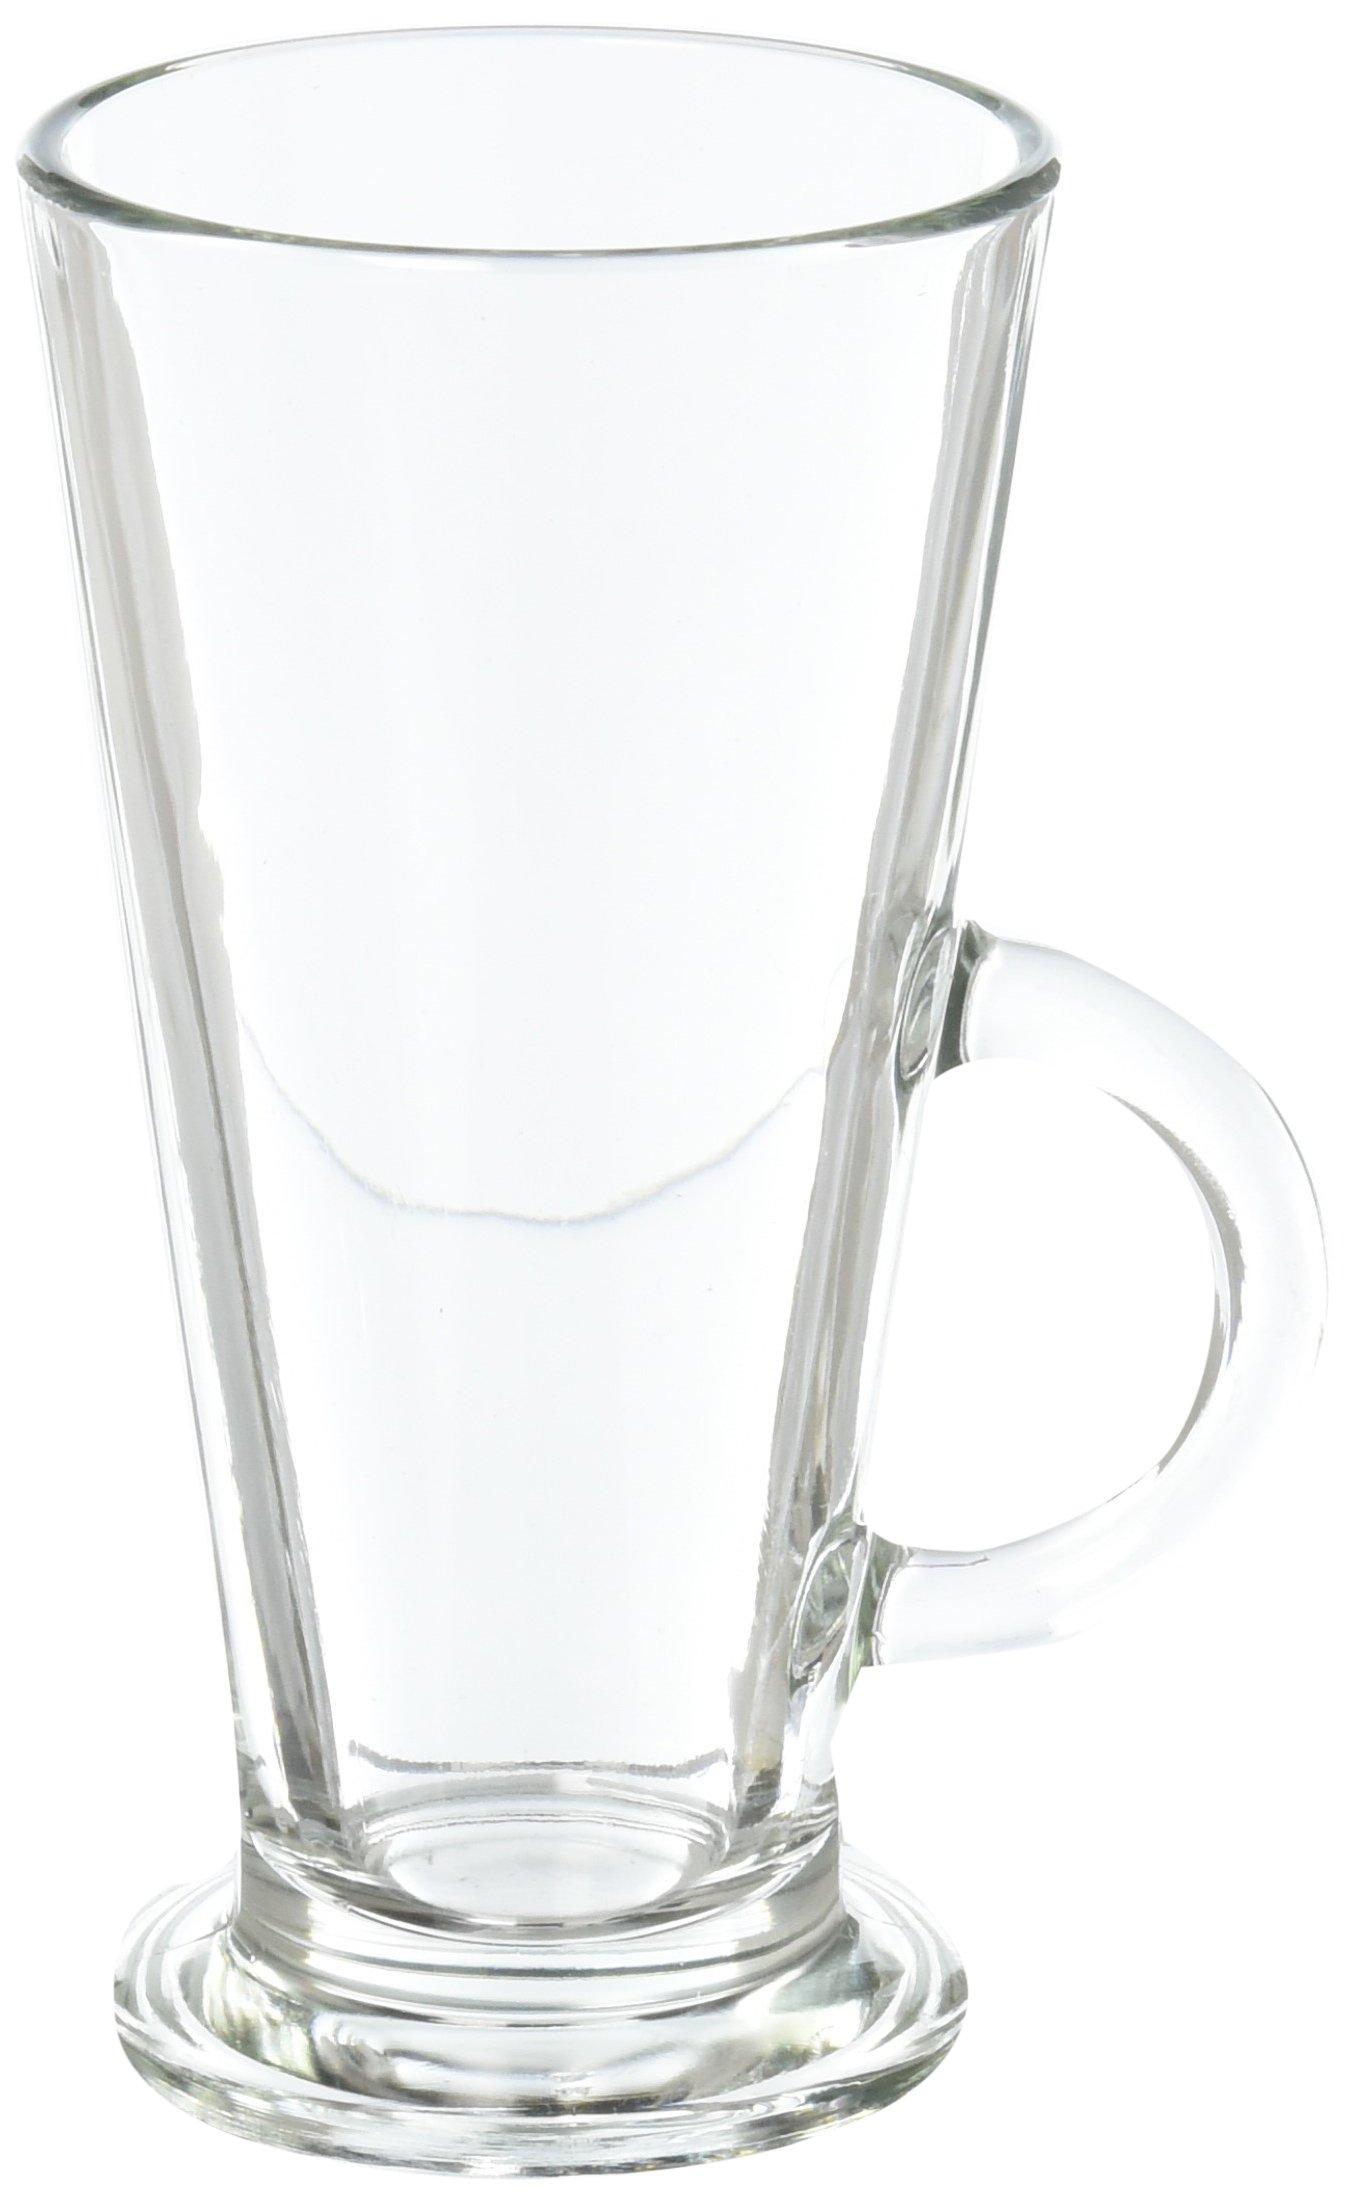 Sagaform 5017615 IrishCoffee Glasses/Mugs, 2 Pack, 8 1/2-Ounce